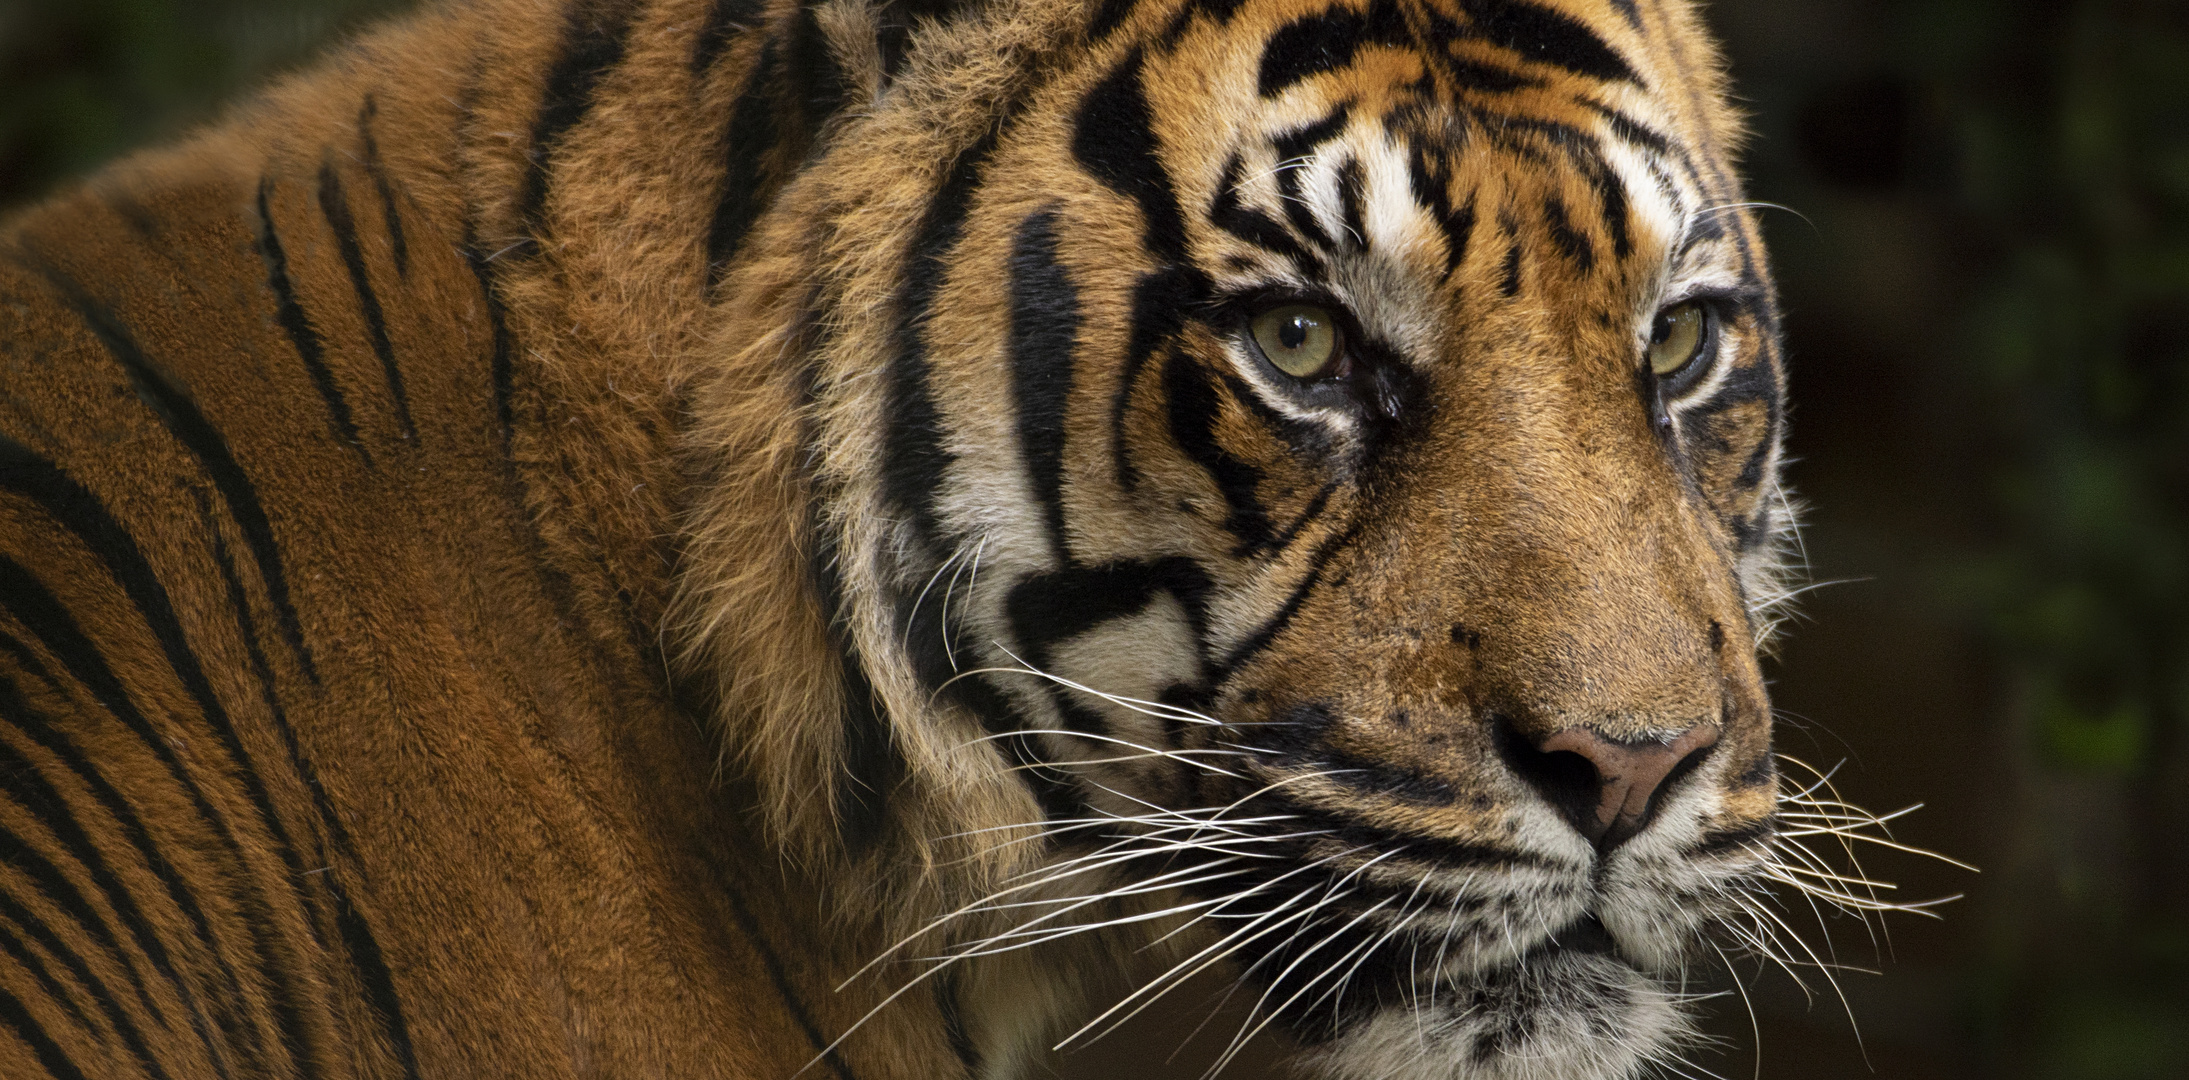 Regard... (Panthera tigris sumatrae, tigre de Sumatra)